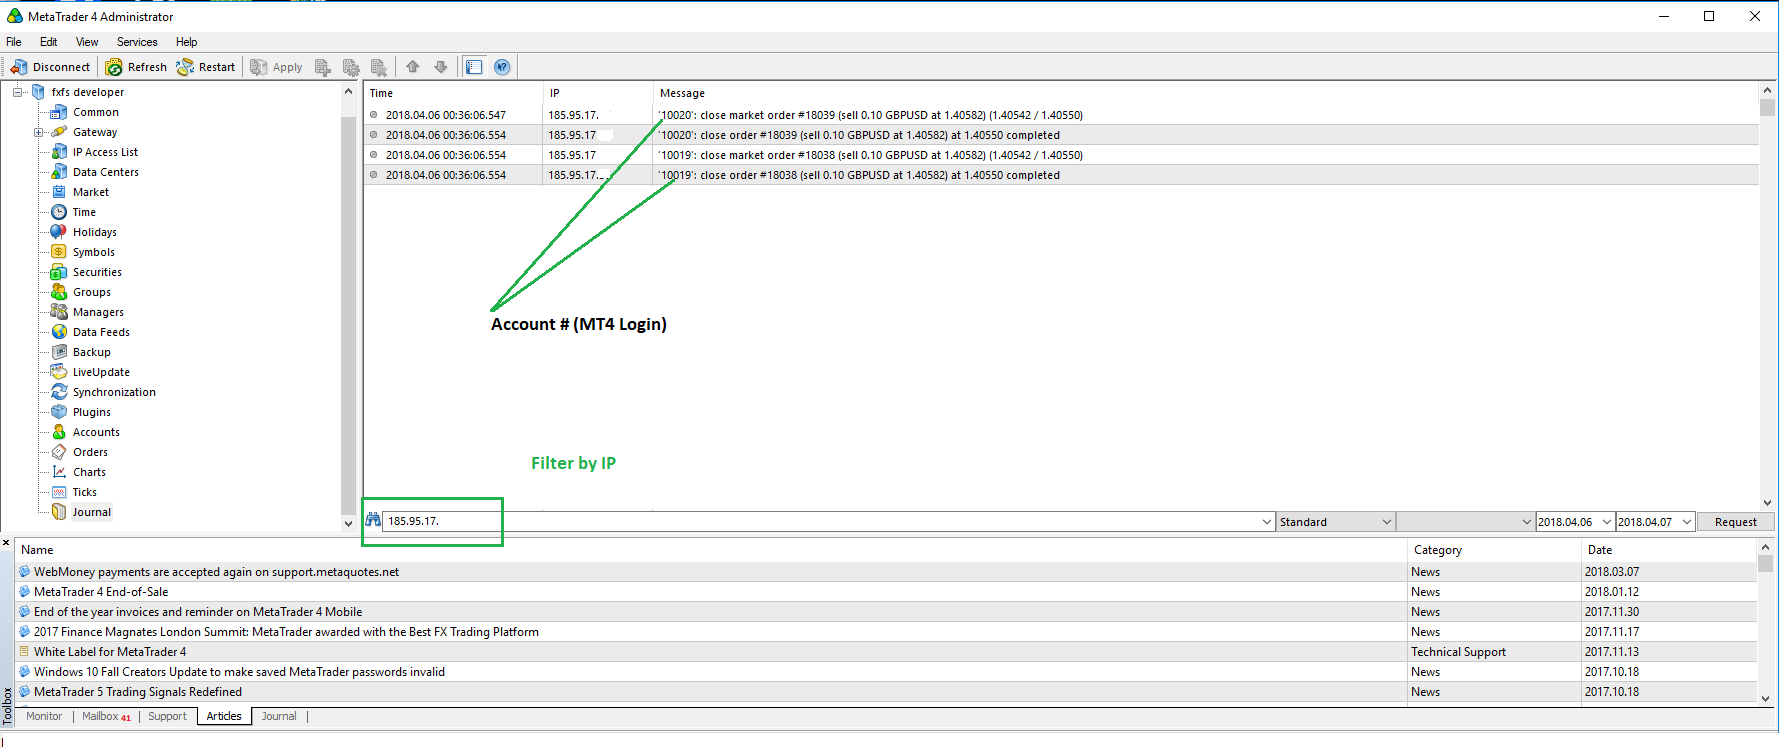 mt4 administrator ip filter